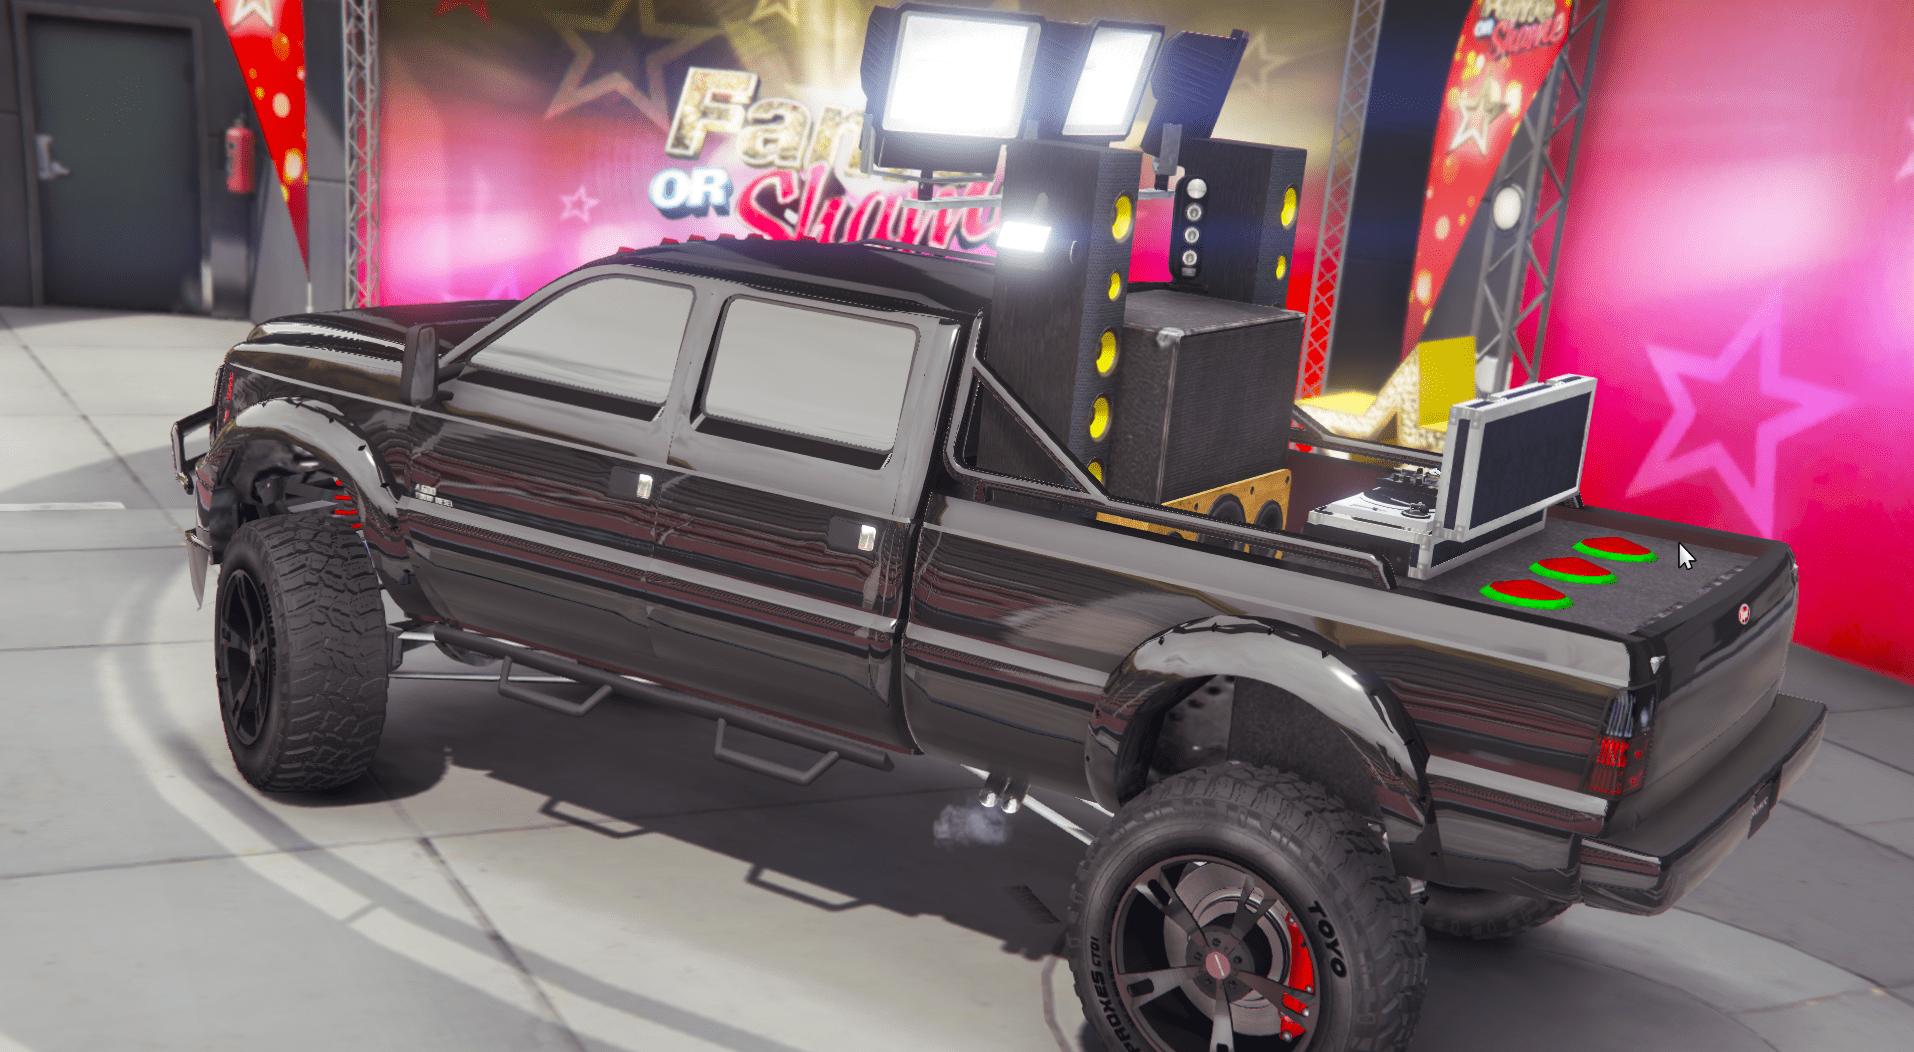 Open Jeep Images Download >> DJ Sandking Truck [Menyoo] - GTA5-Mods.com